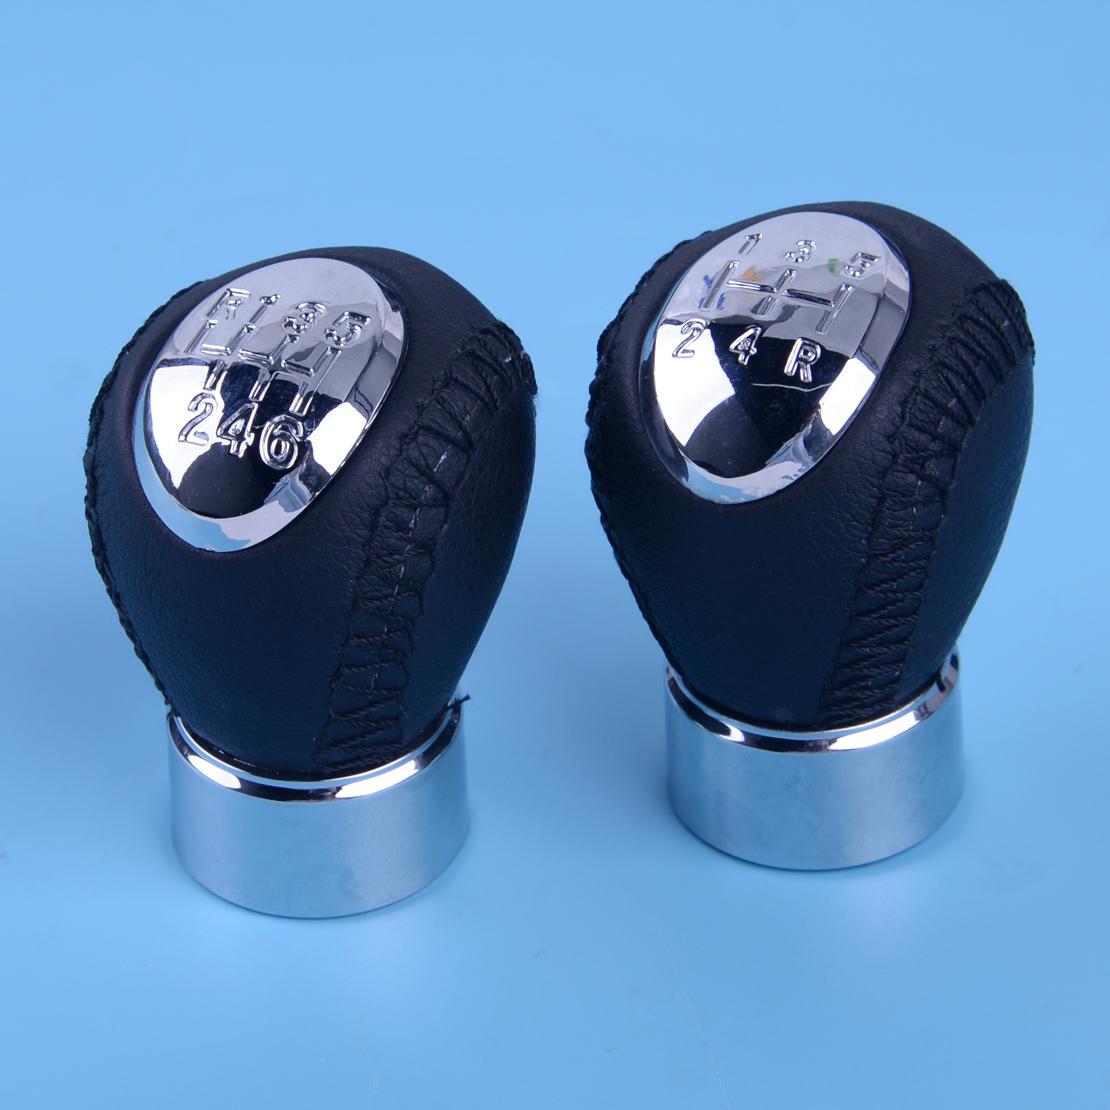 6 Gang Schaltknauf Schaltknopf für Mazda 3 BK 5 CR 6 GG GY 323 626 GF RX-8 MPV